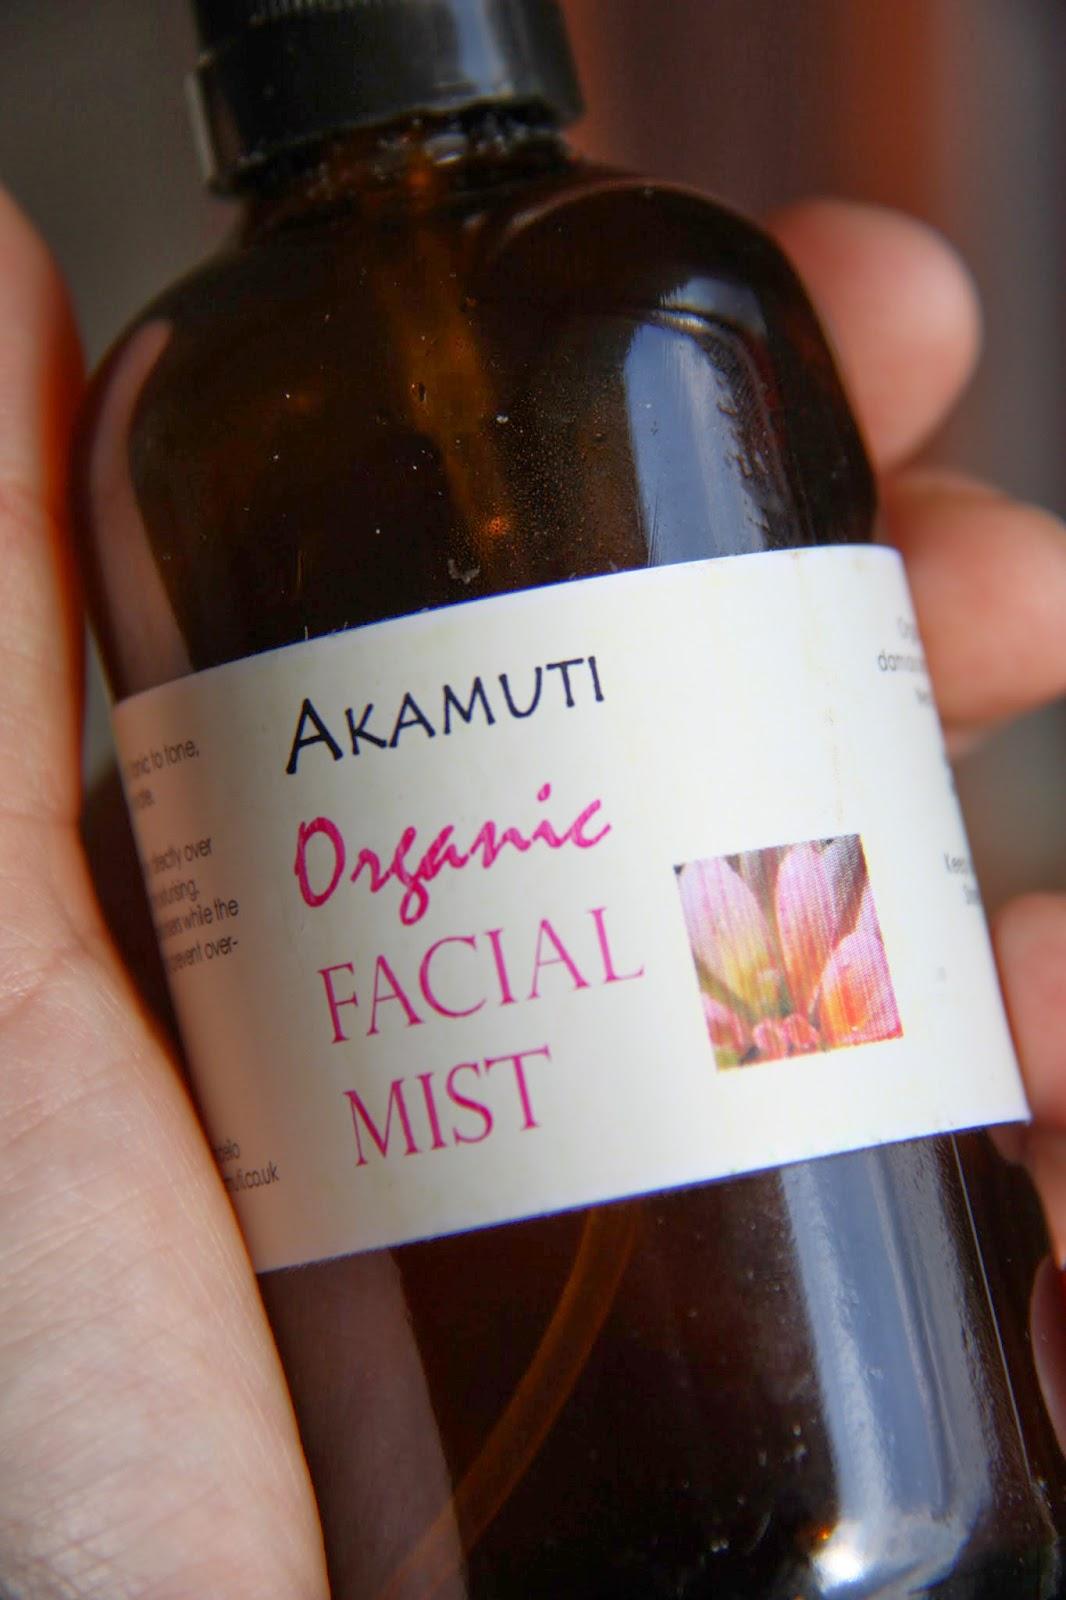 Organic facial mist